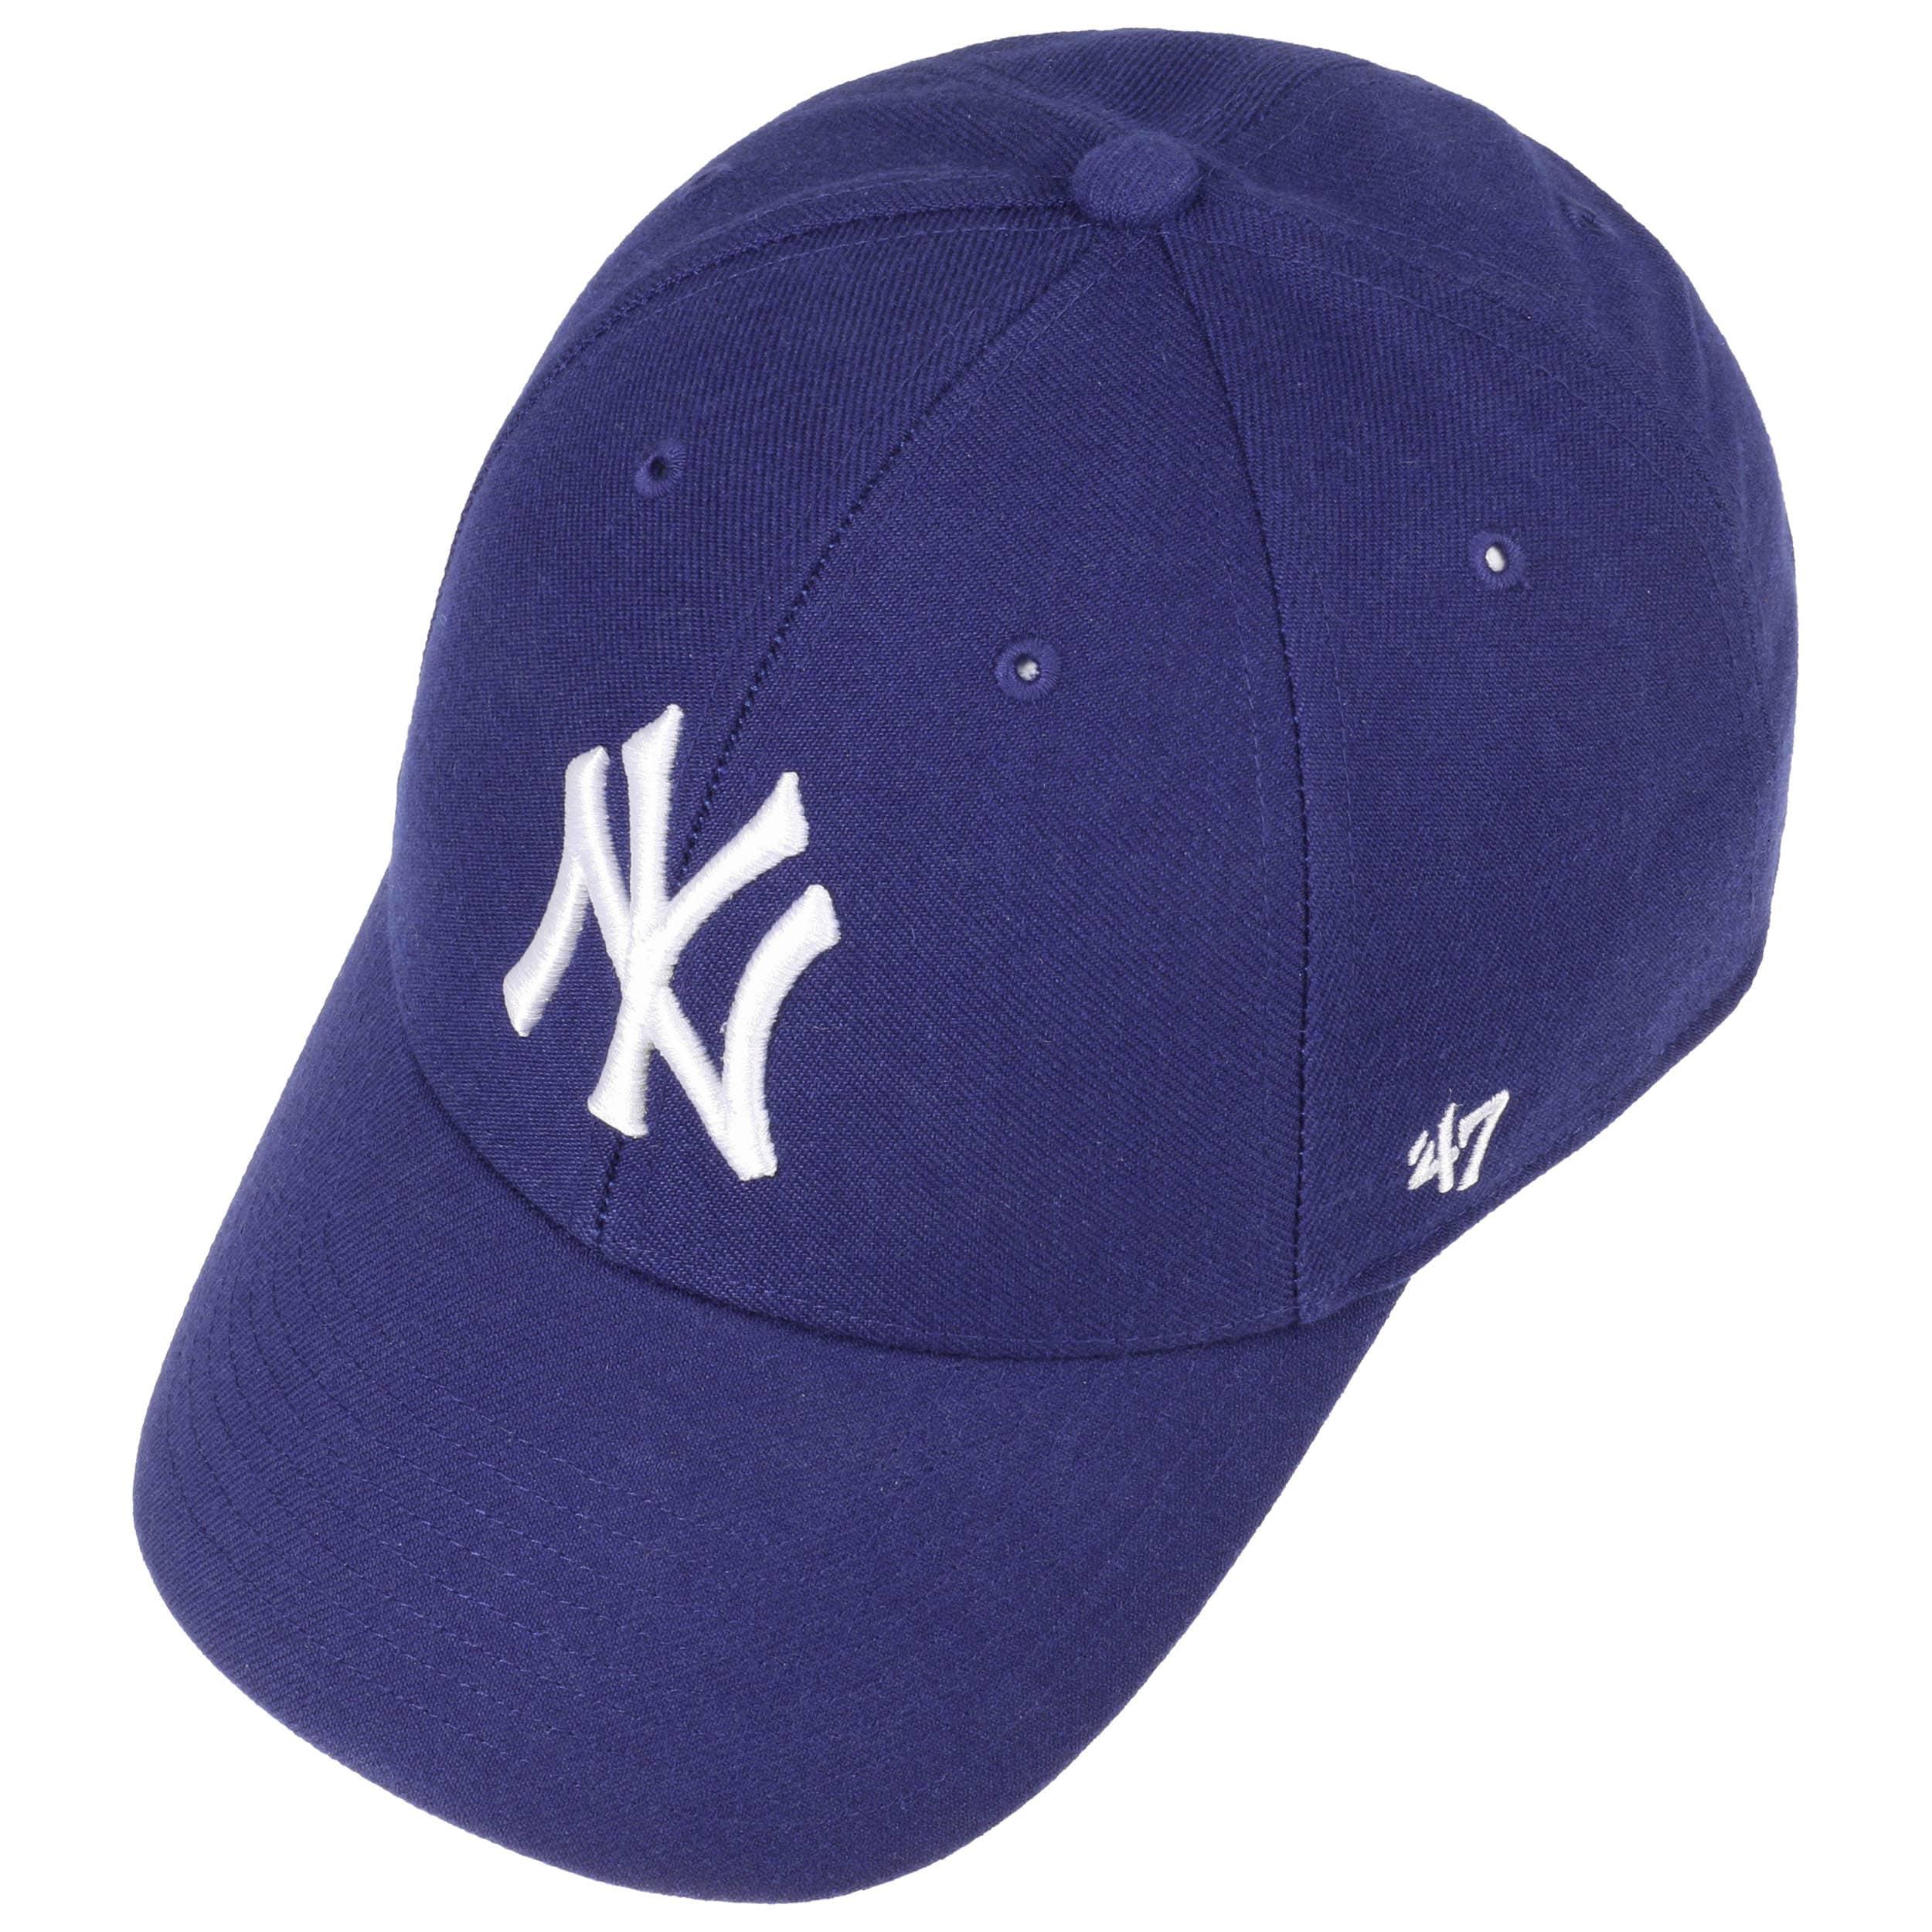 b59f4c8077e ... MVP Yankees Youth Cap by 47 Brand - royal-blue 1 ...